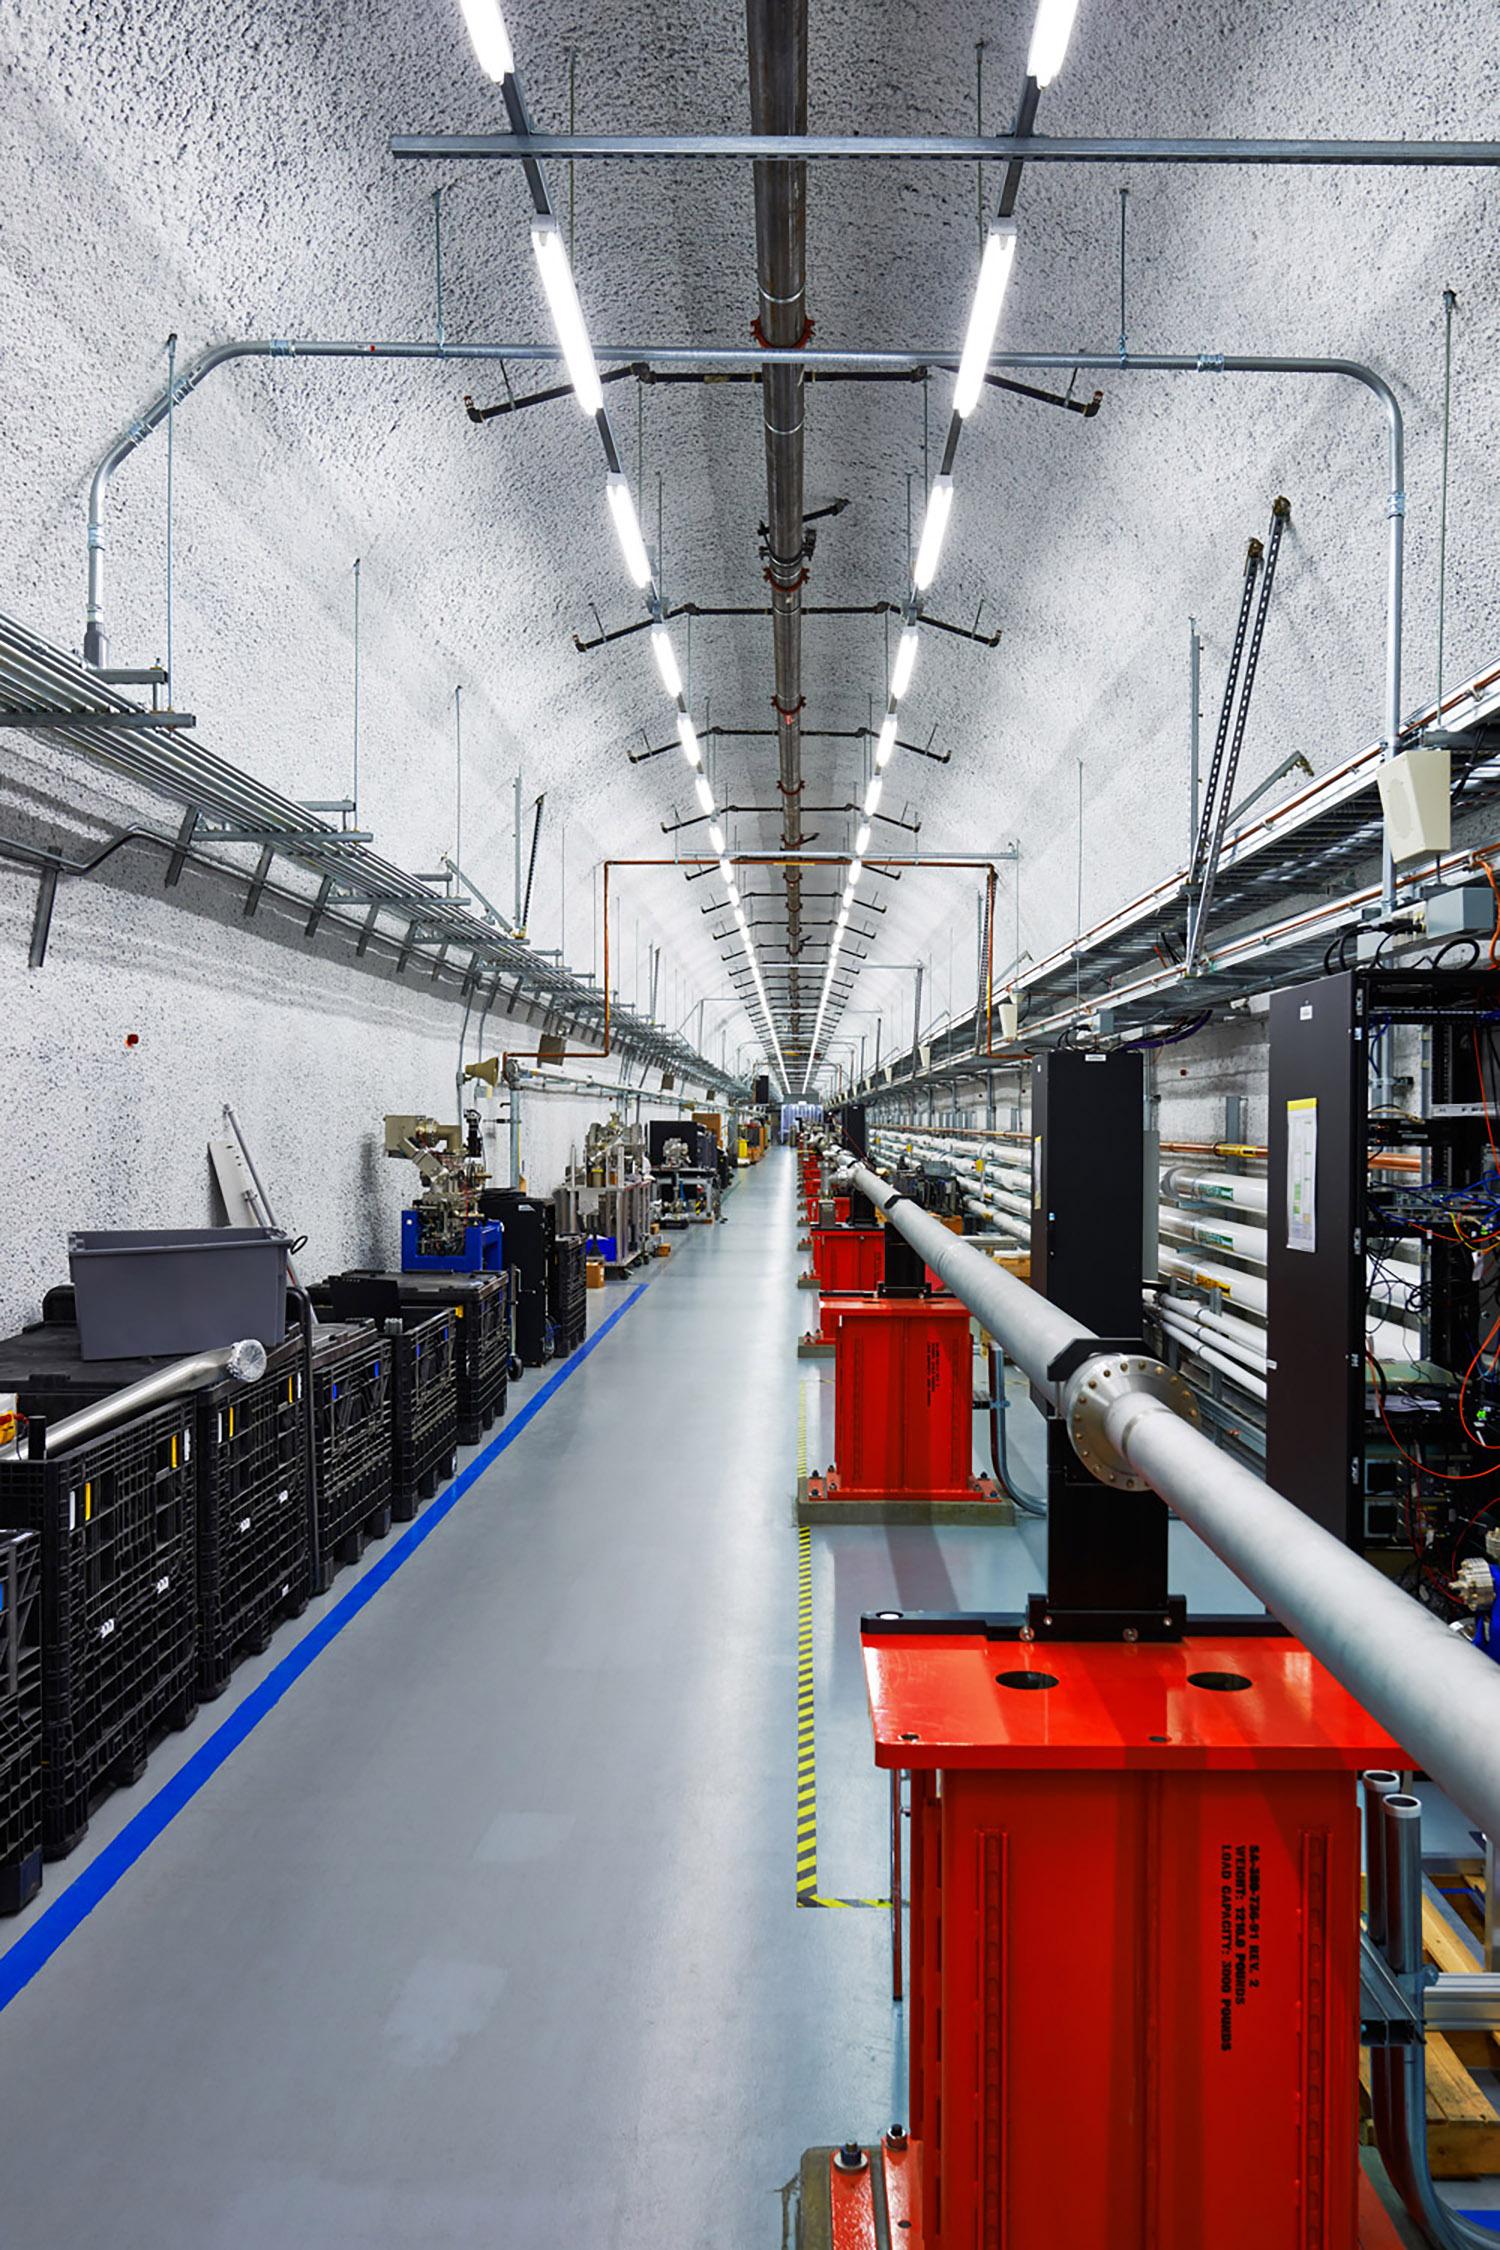 SLAC National Accelerator Laboratory, Stanford, California, 2013